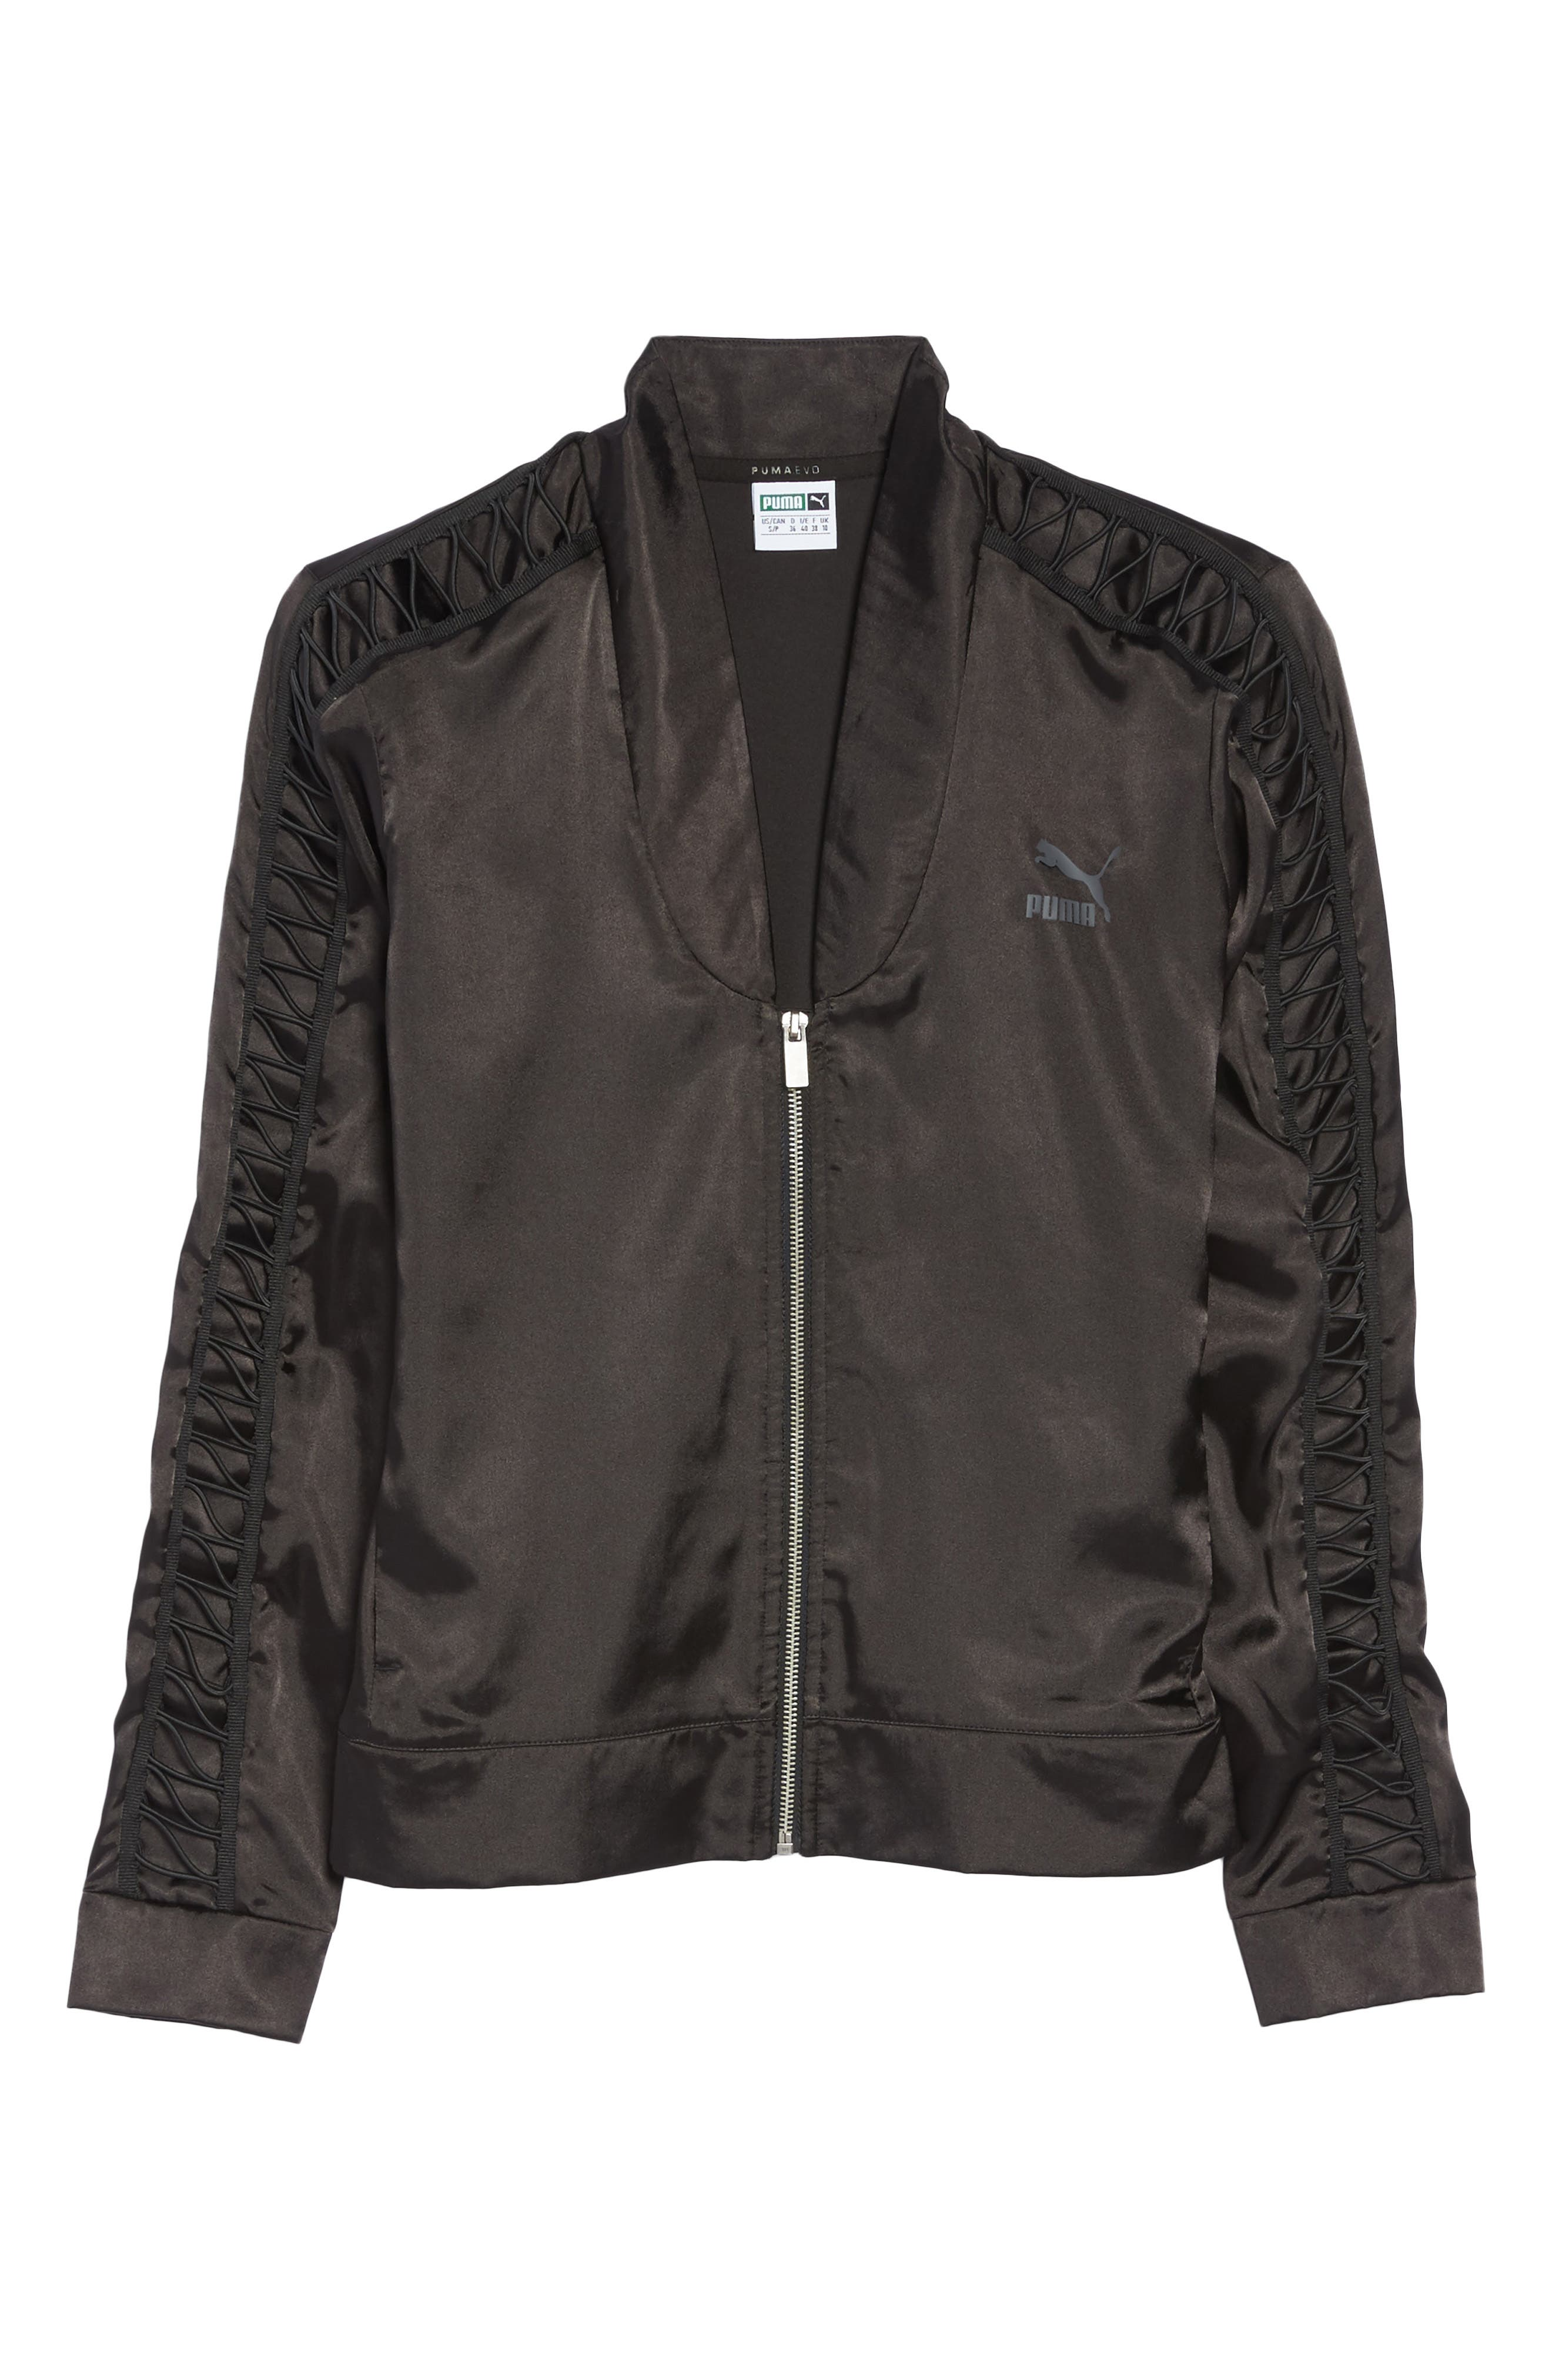 Satin Track Jacket,                             Alternate thumbnail 7, color,                             Puma Black